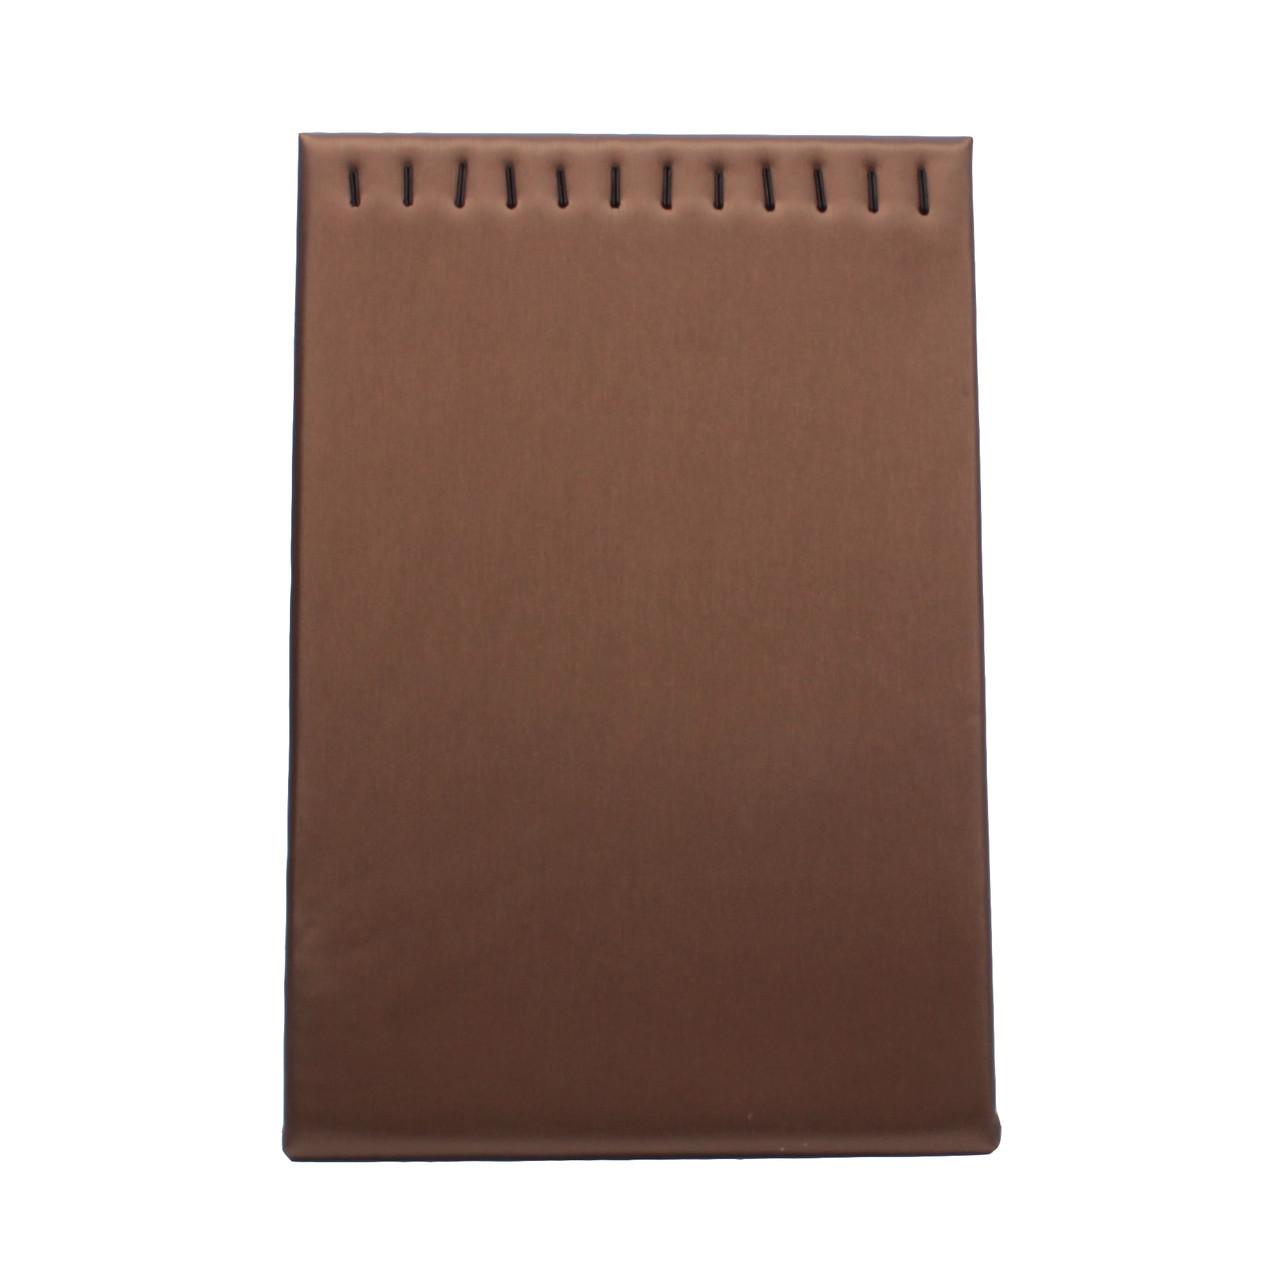 Подставка L для цепочек коричневая